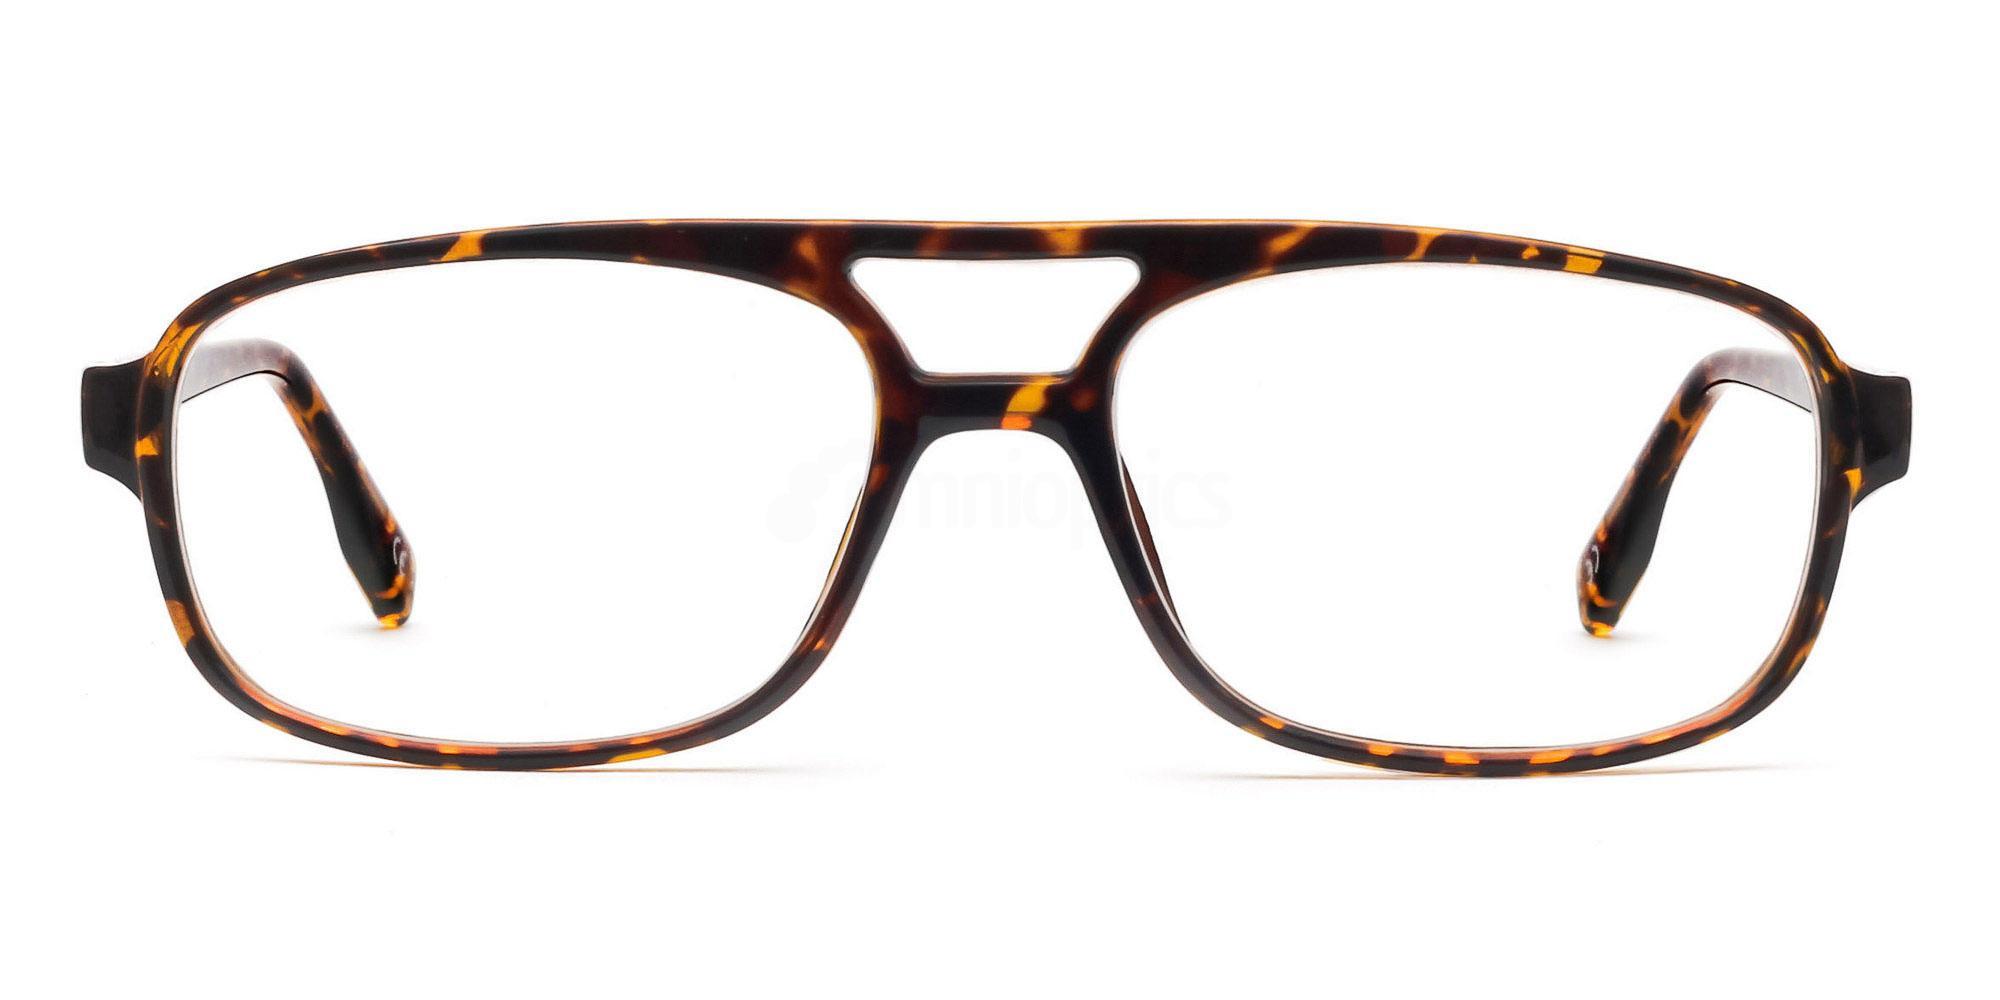 Demi P2395 - Demi Glasses, Savannah